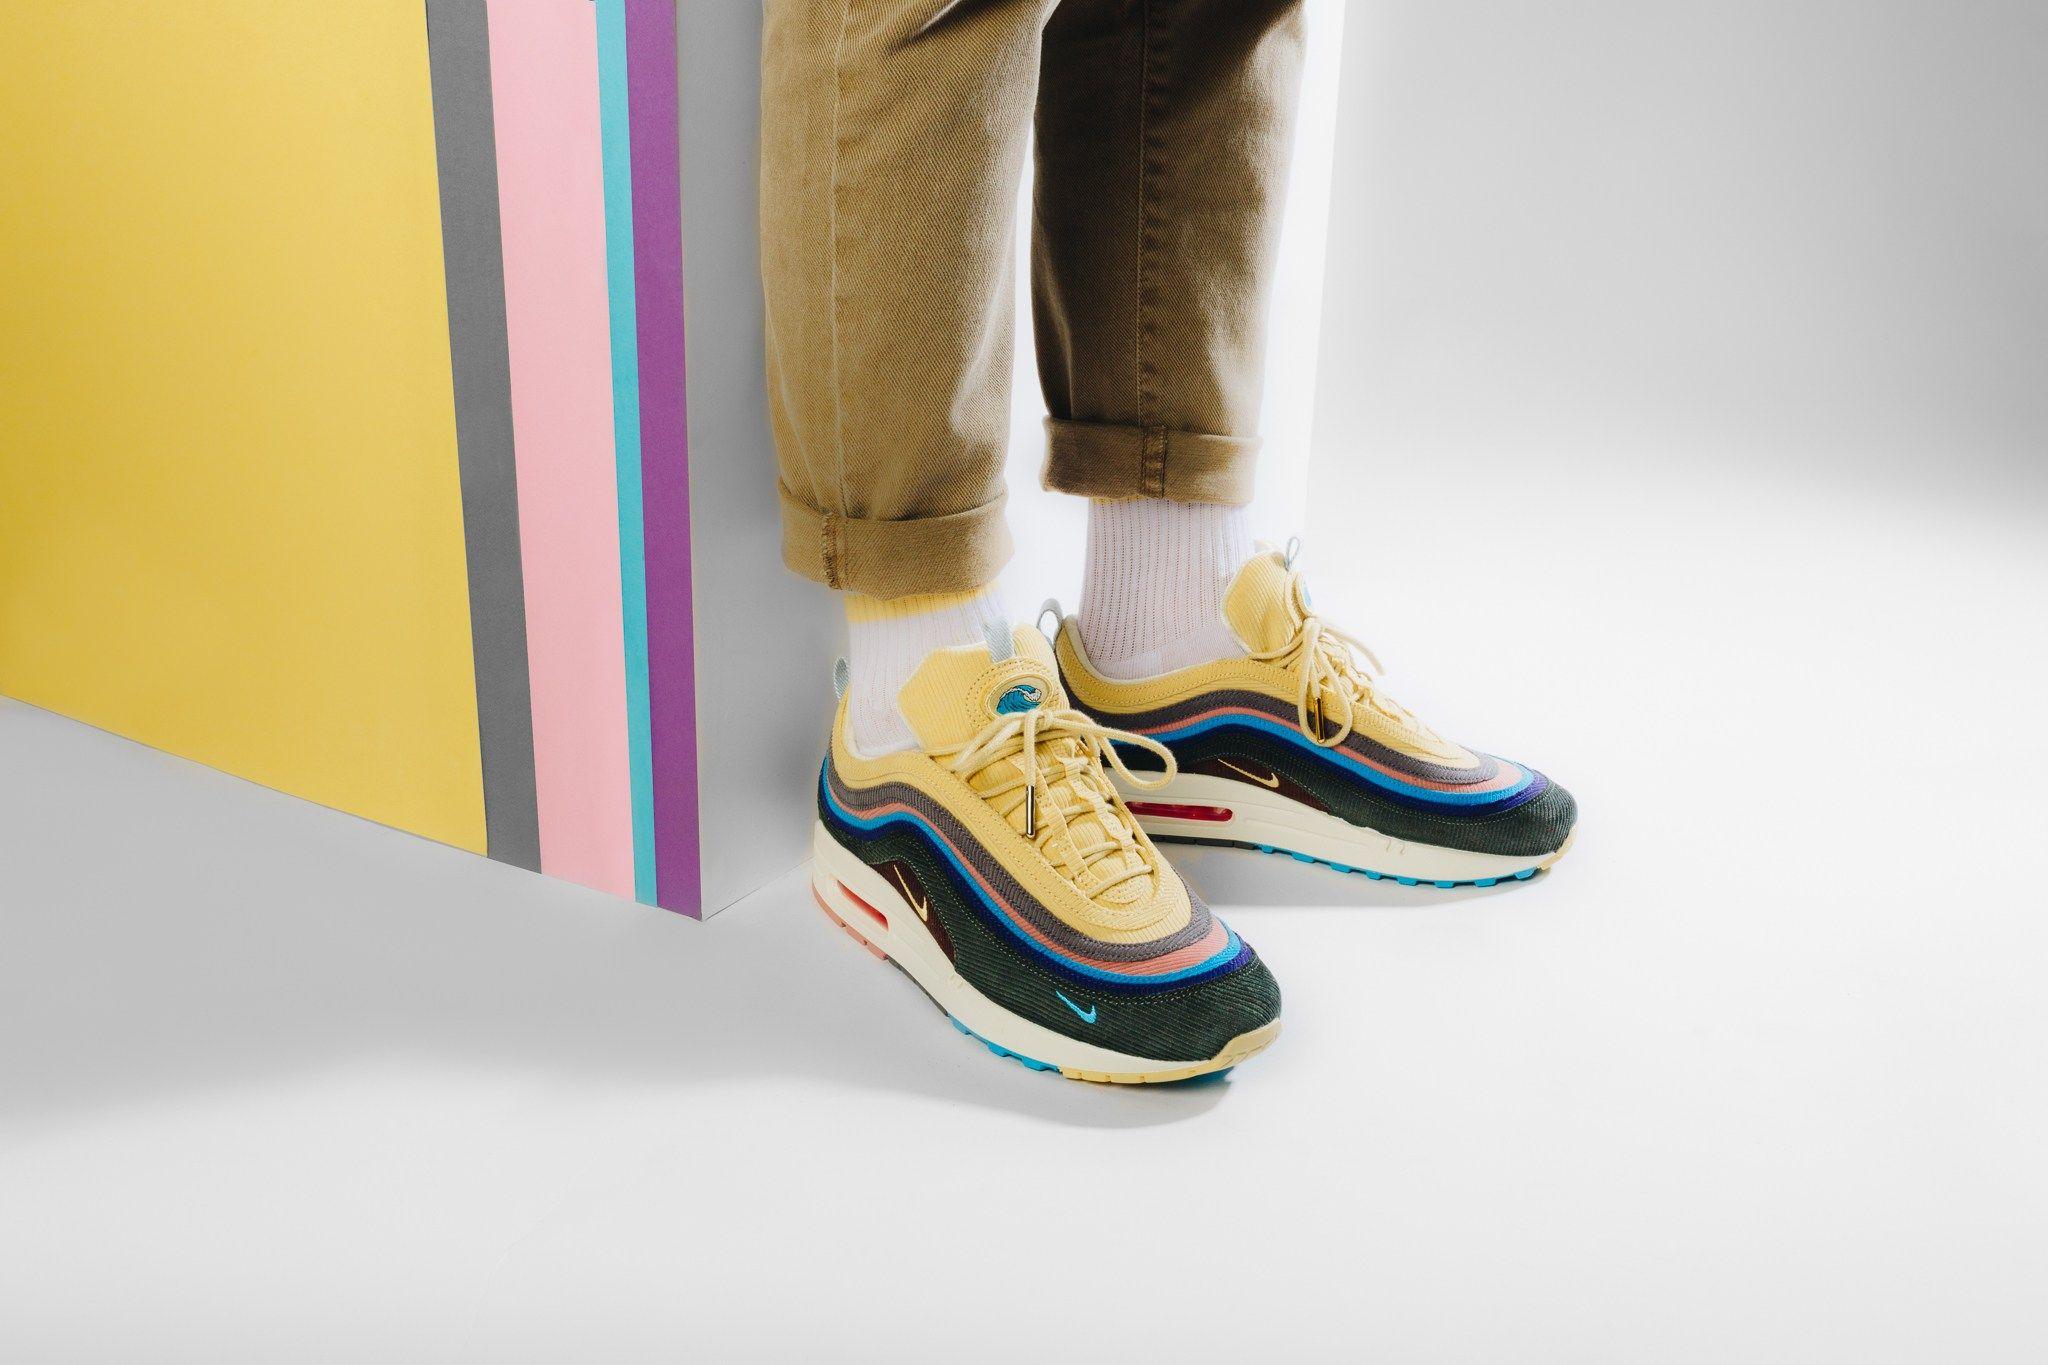 69600a632673 On-Foot  Nike Air Max 1 97 SW - EU Kicks  Sneaker Magazine